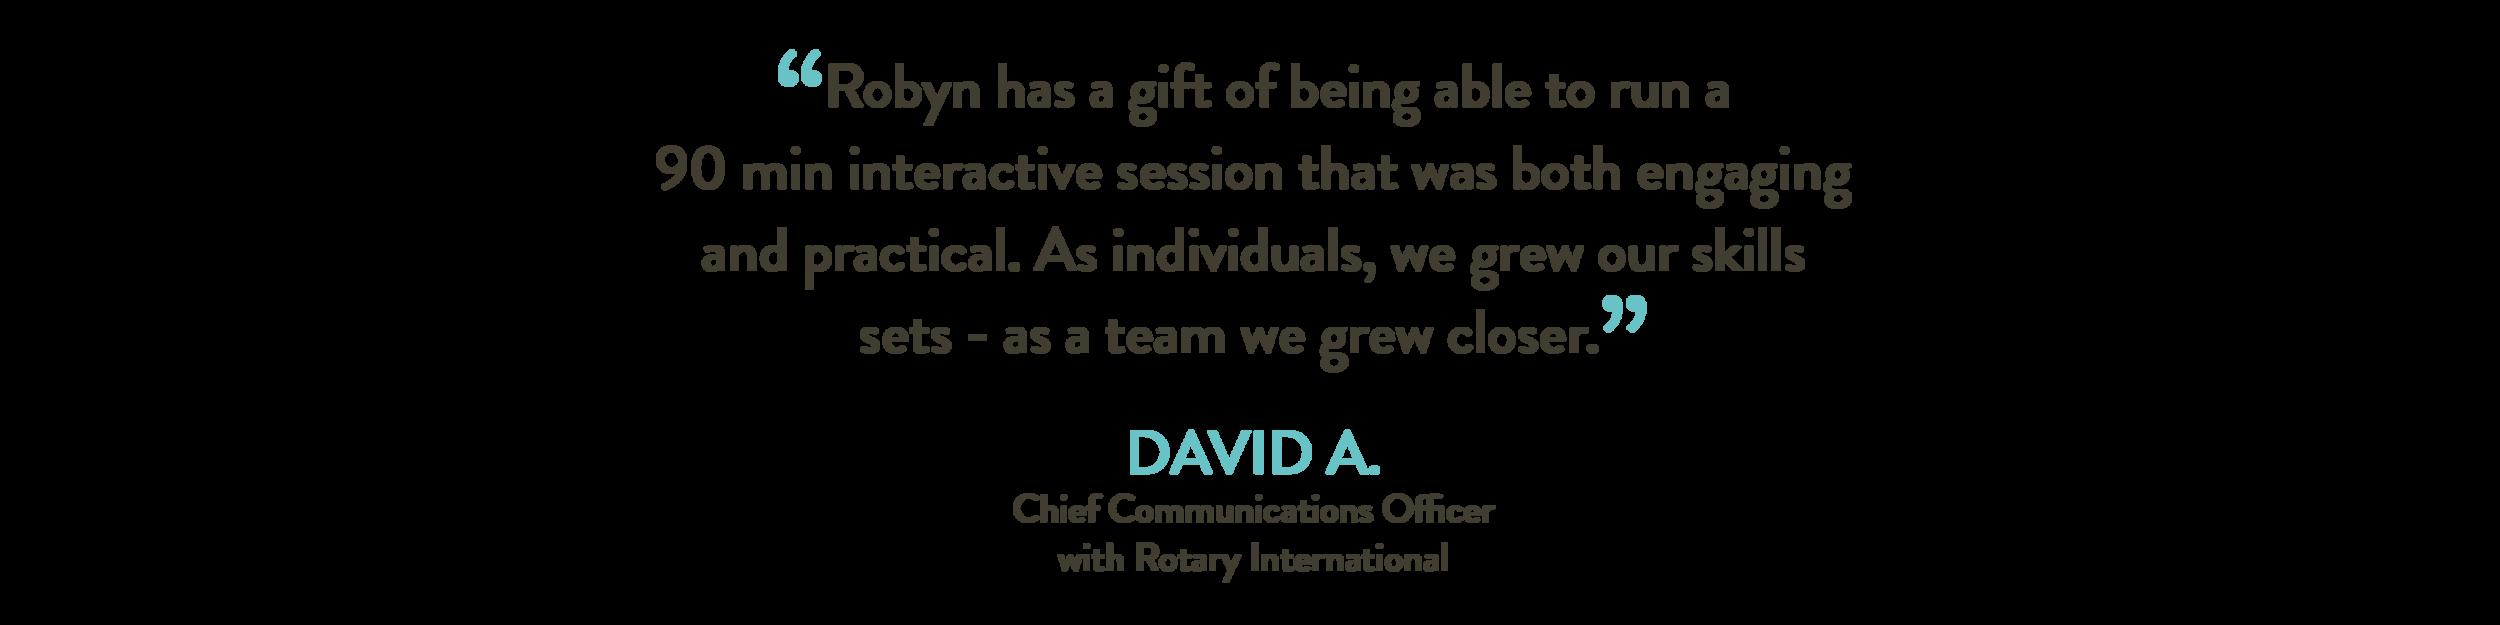 RLS_Testimonials_Speaker_David A.png